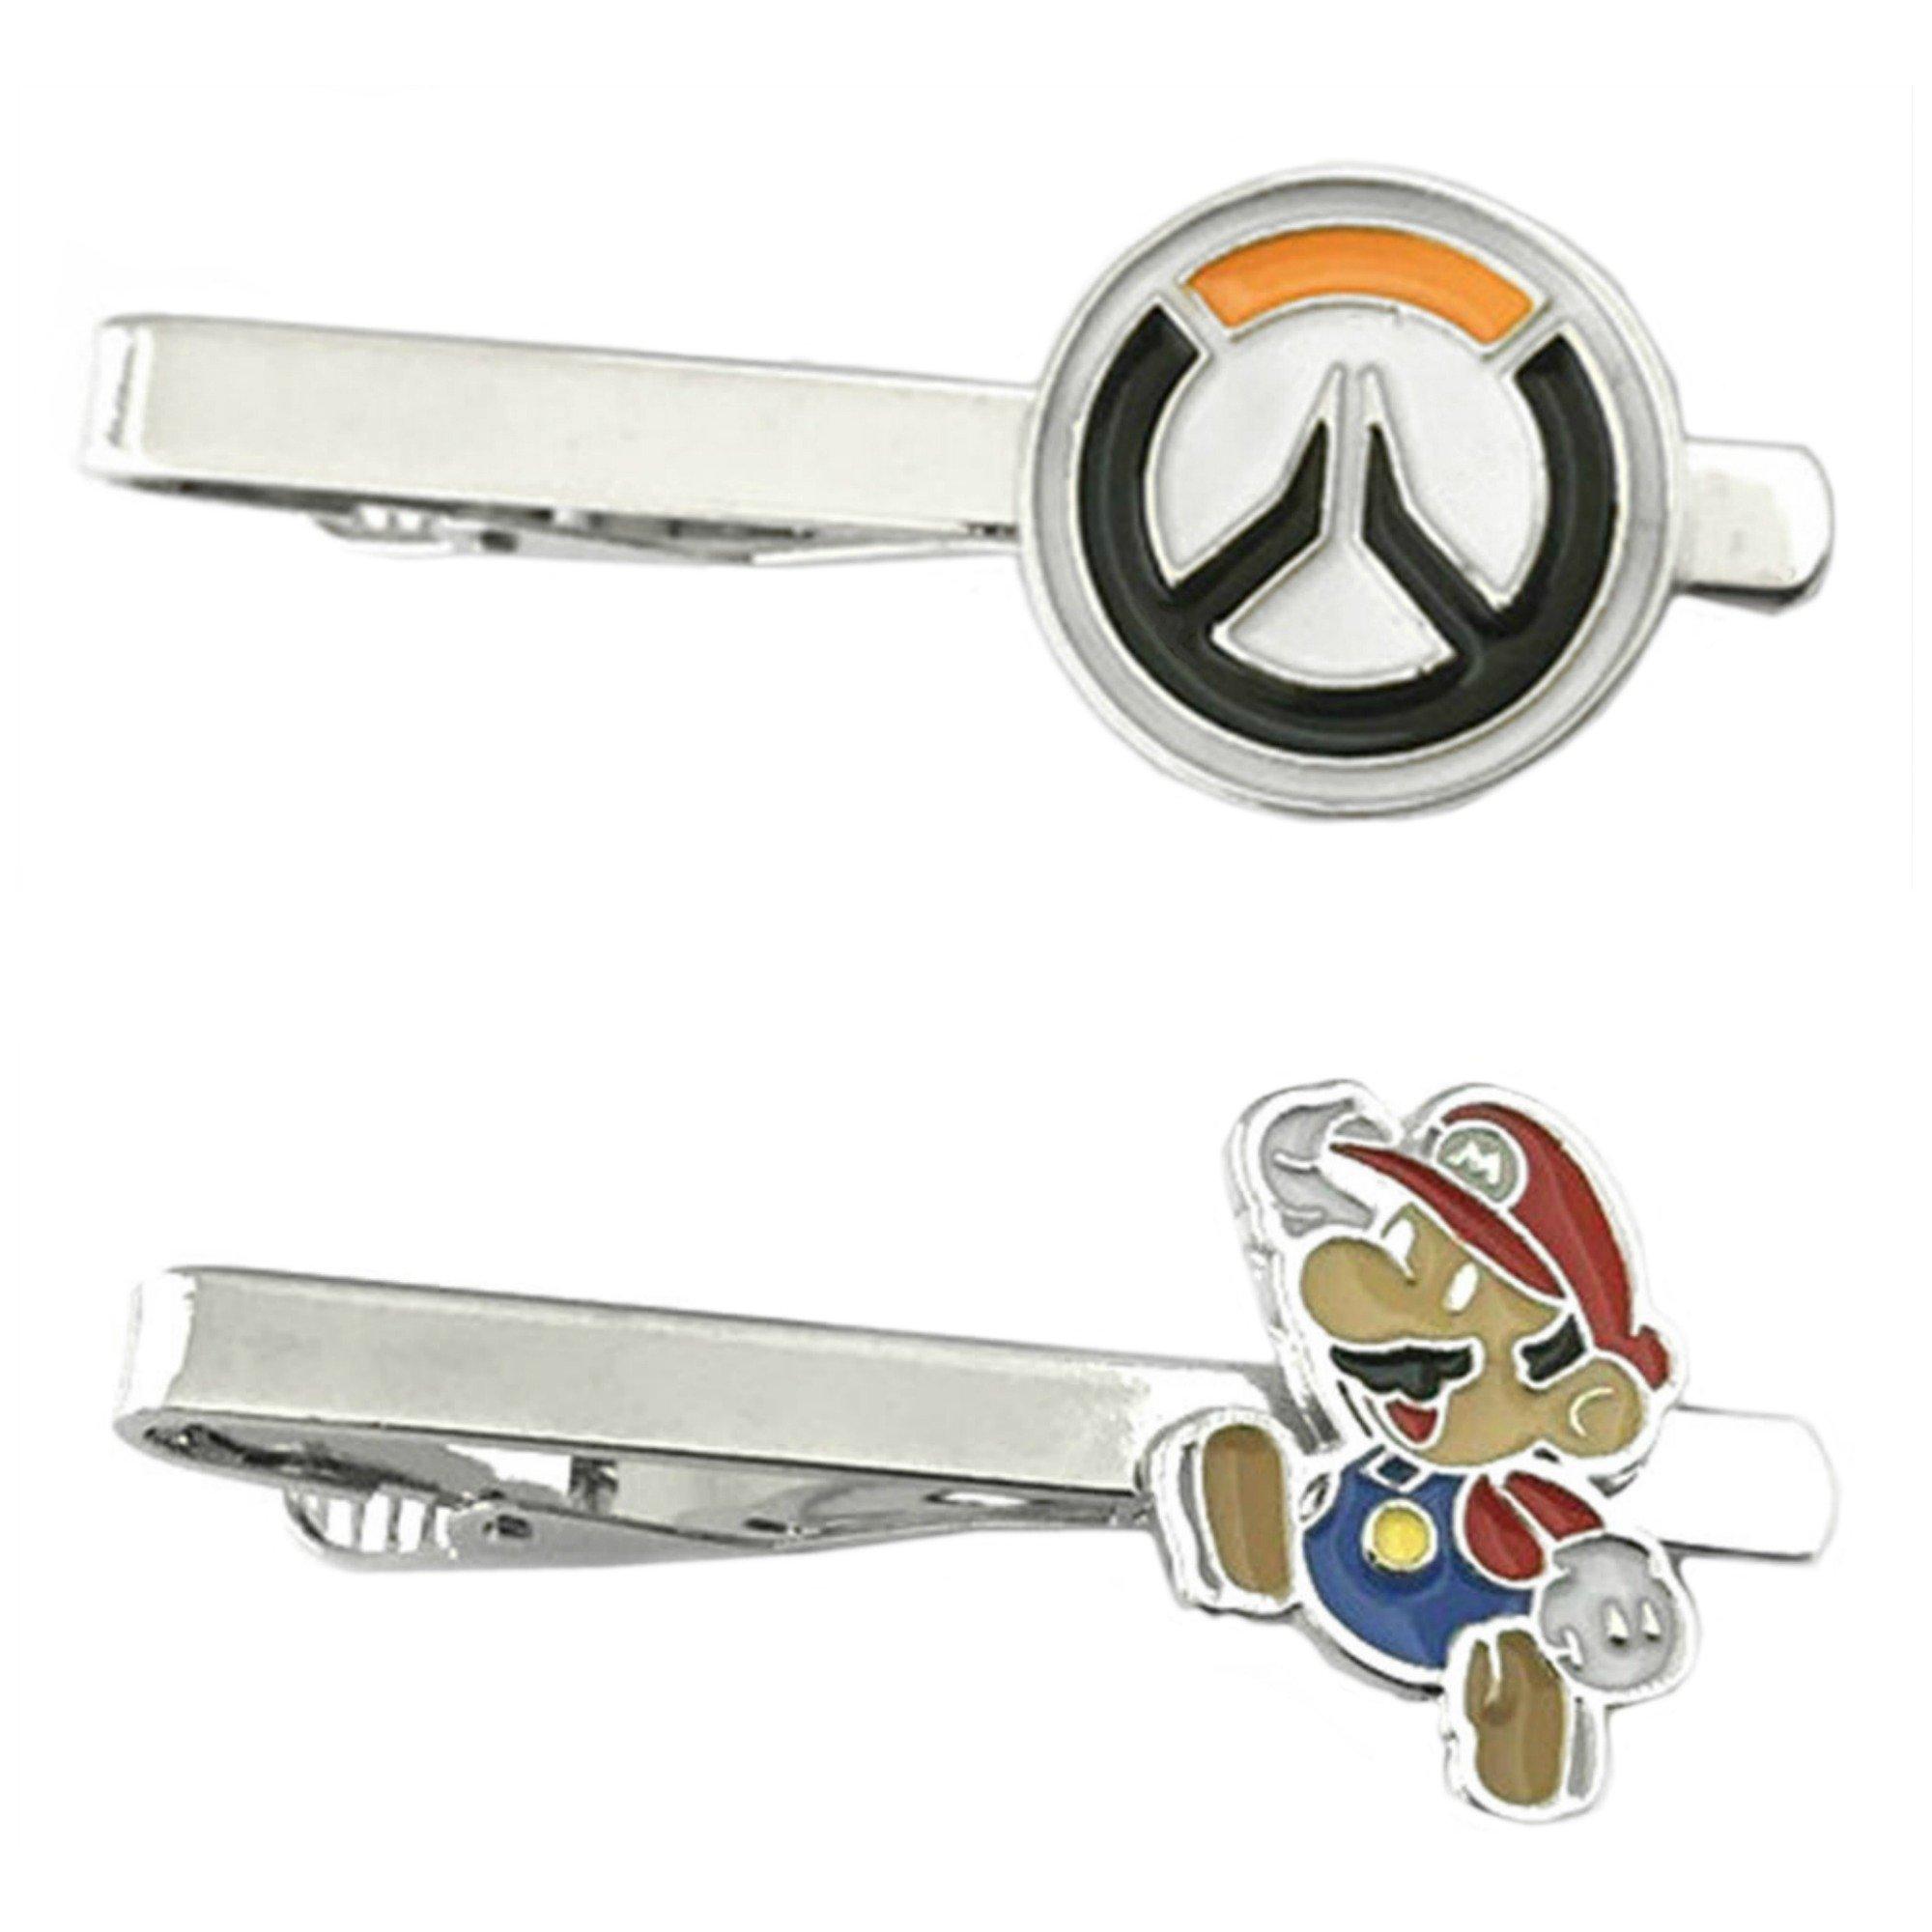 Outlander Video Games - Overwatch & Mario Jumping - Tiebar Tie Clasp Set of 2 Wedding Superhero Logo w/Gift Box